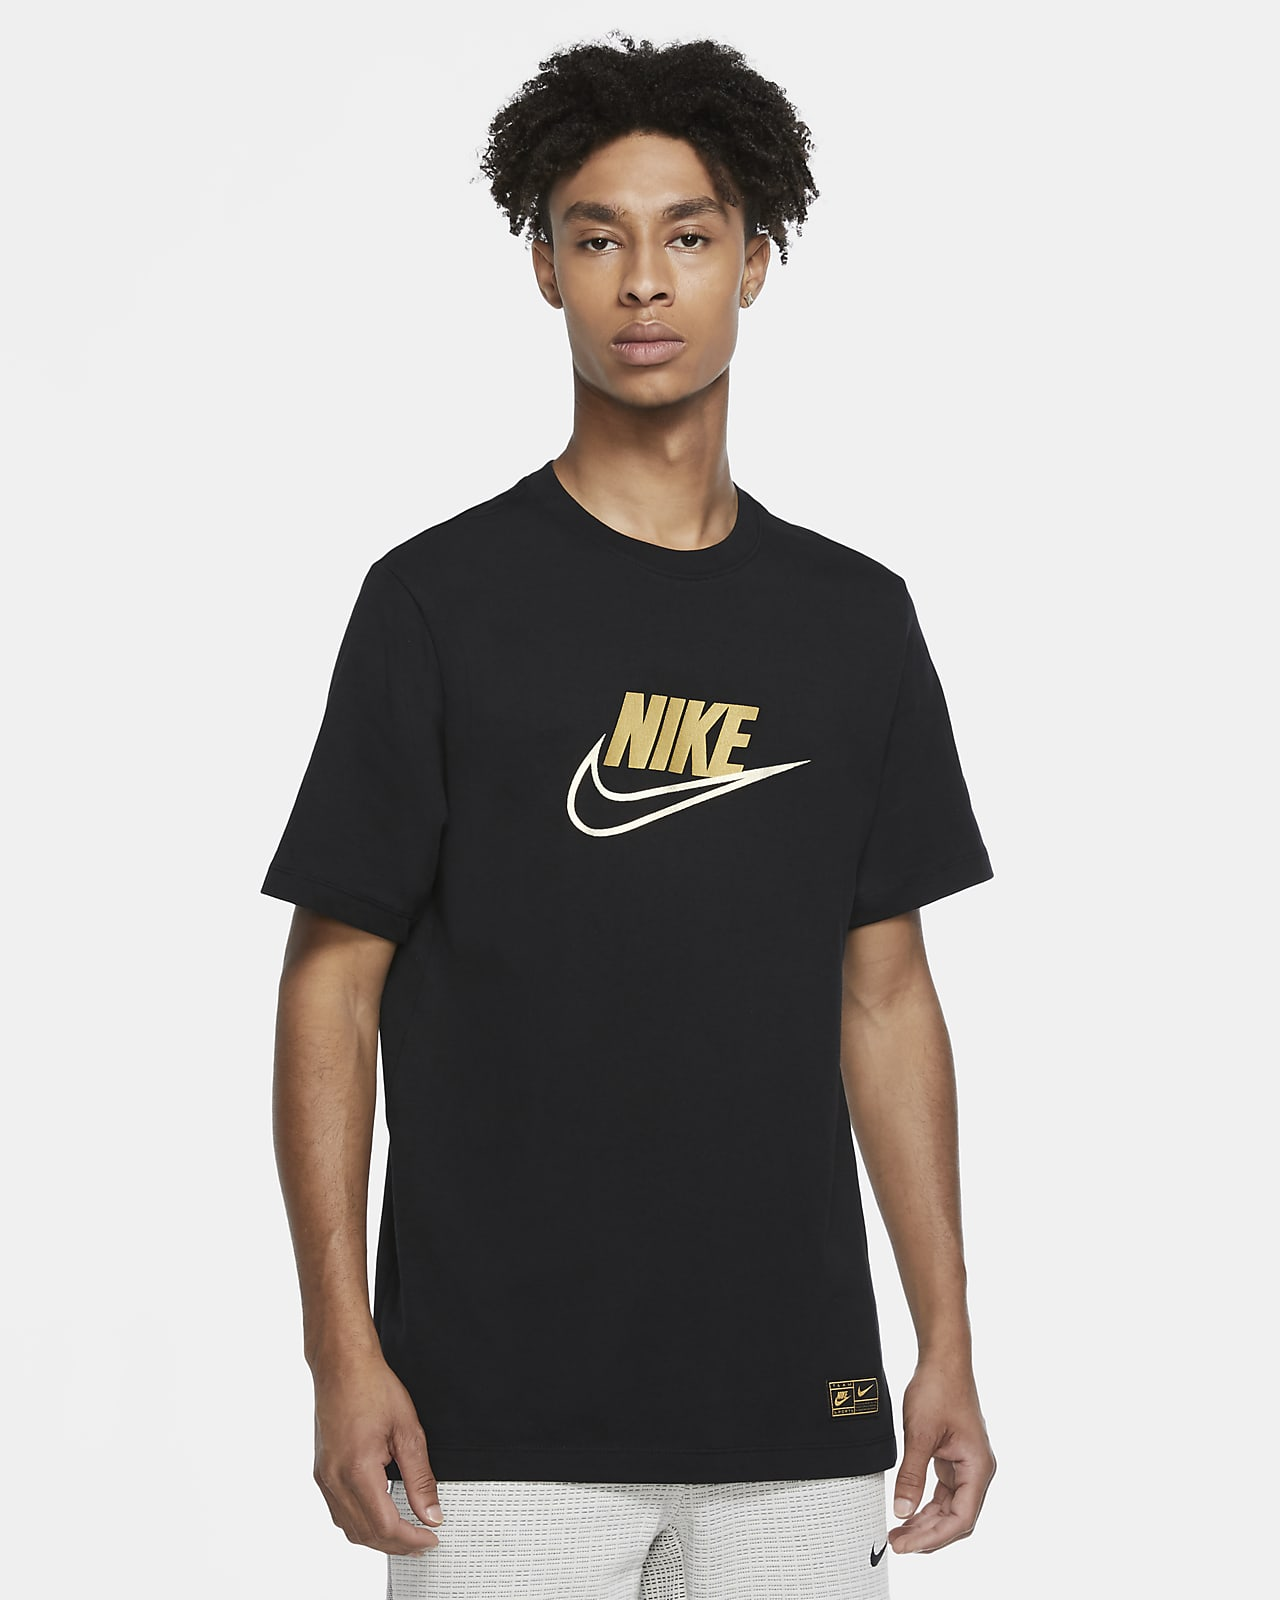 Nike Sportswear Men's Metallic T-Shirt